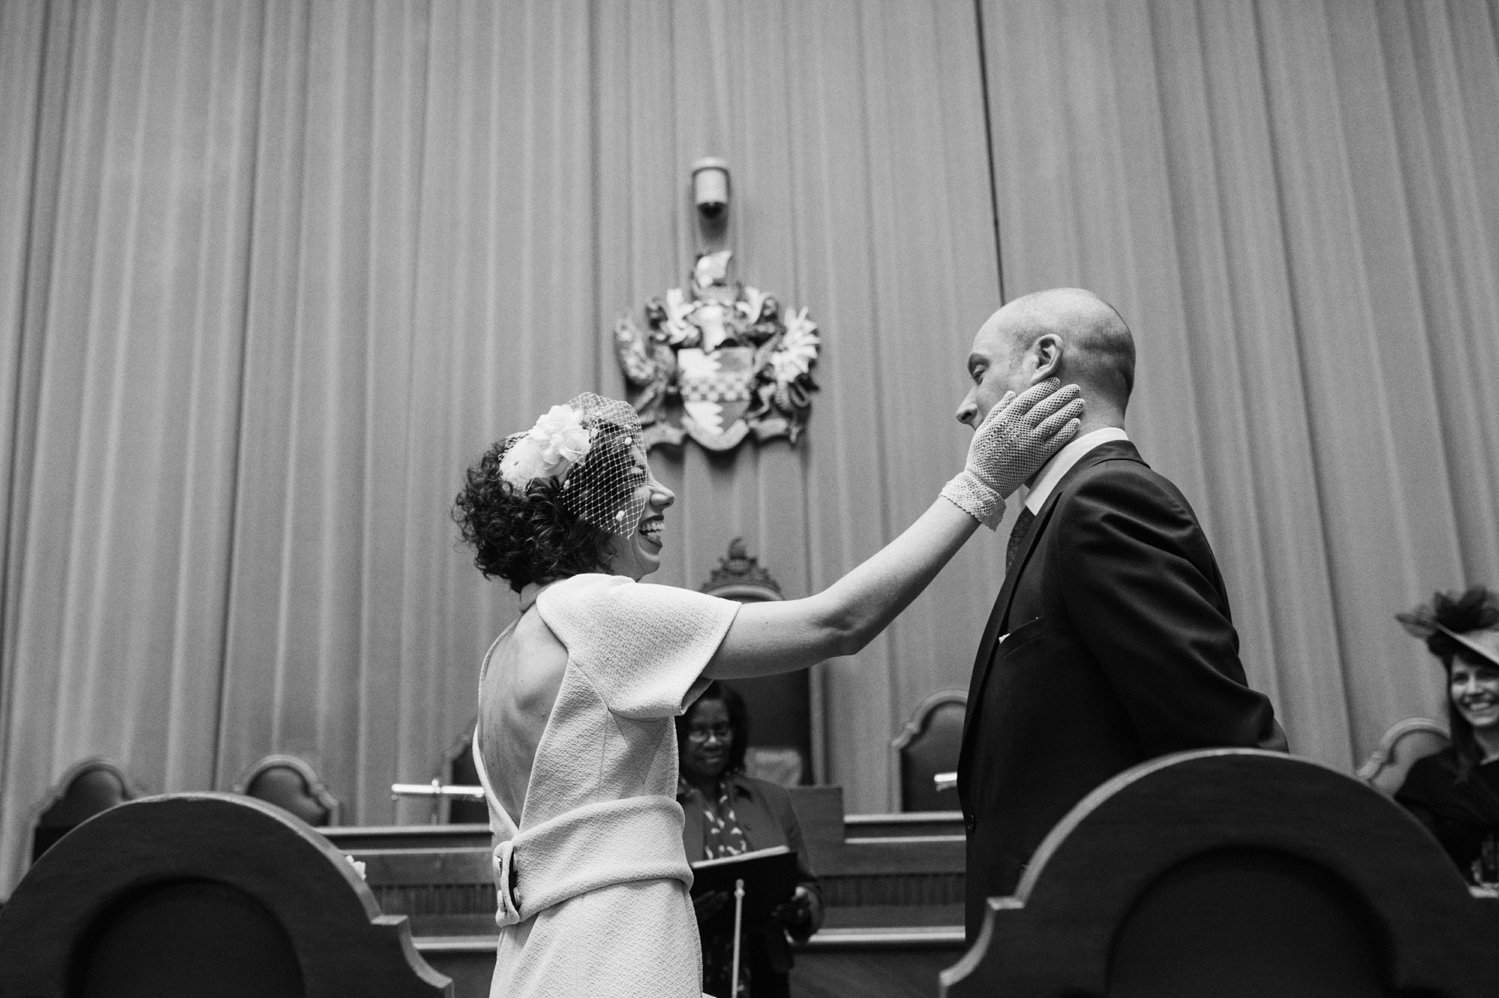 brixton east wedding photographer-5